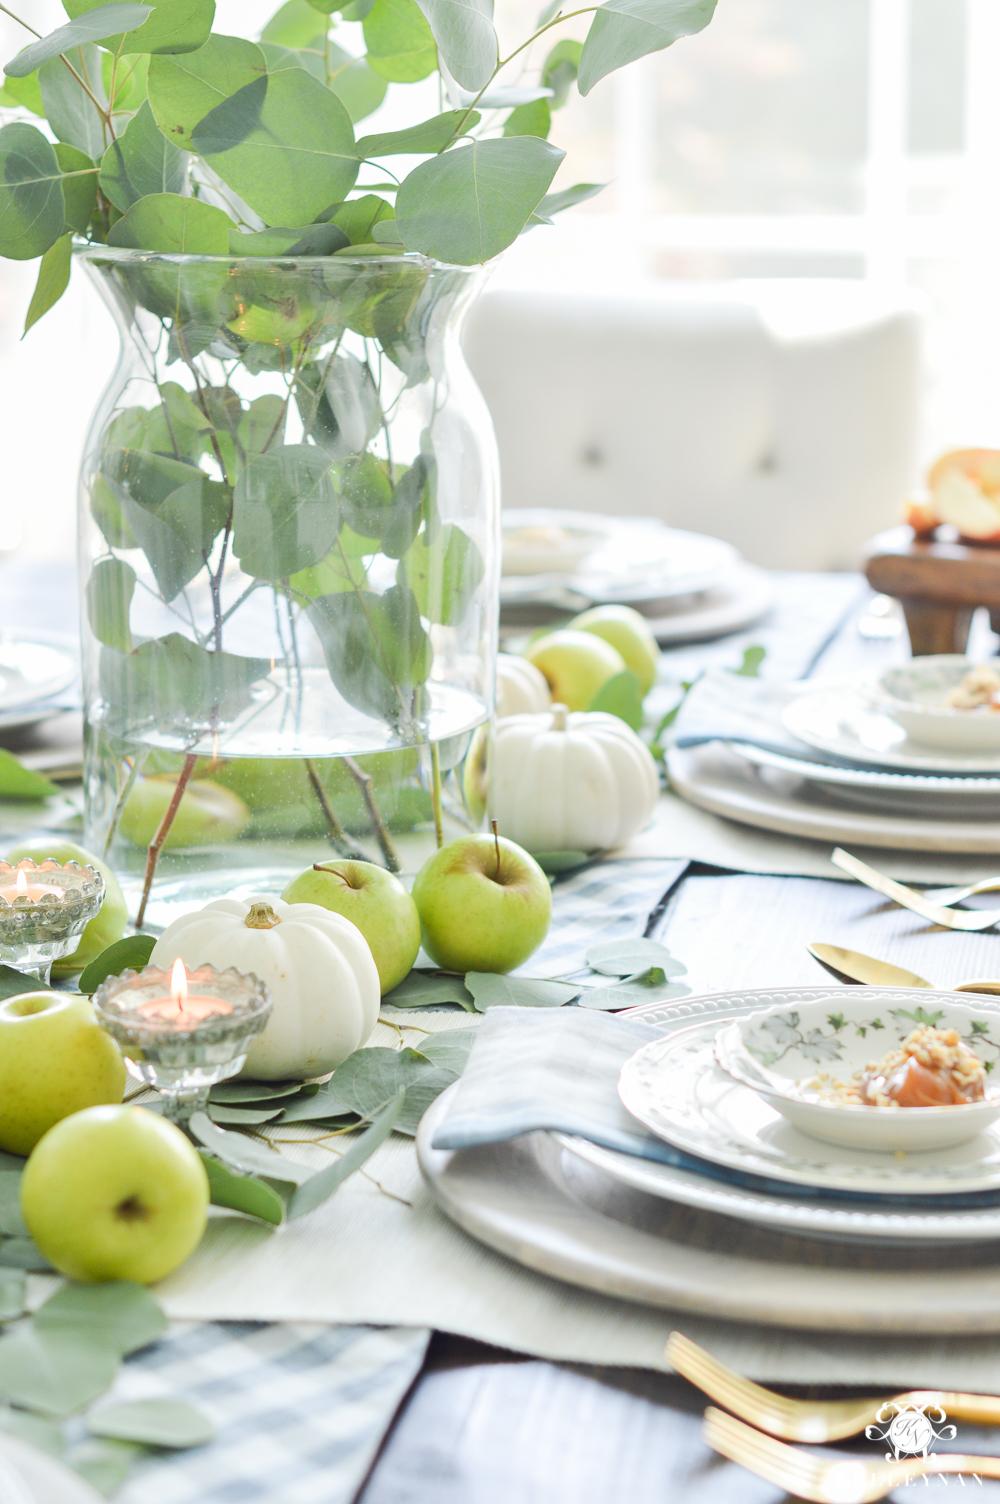 Fall Caramel Apple Table Place Setting Ideas- place setting ideas